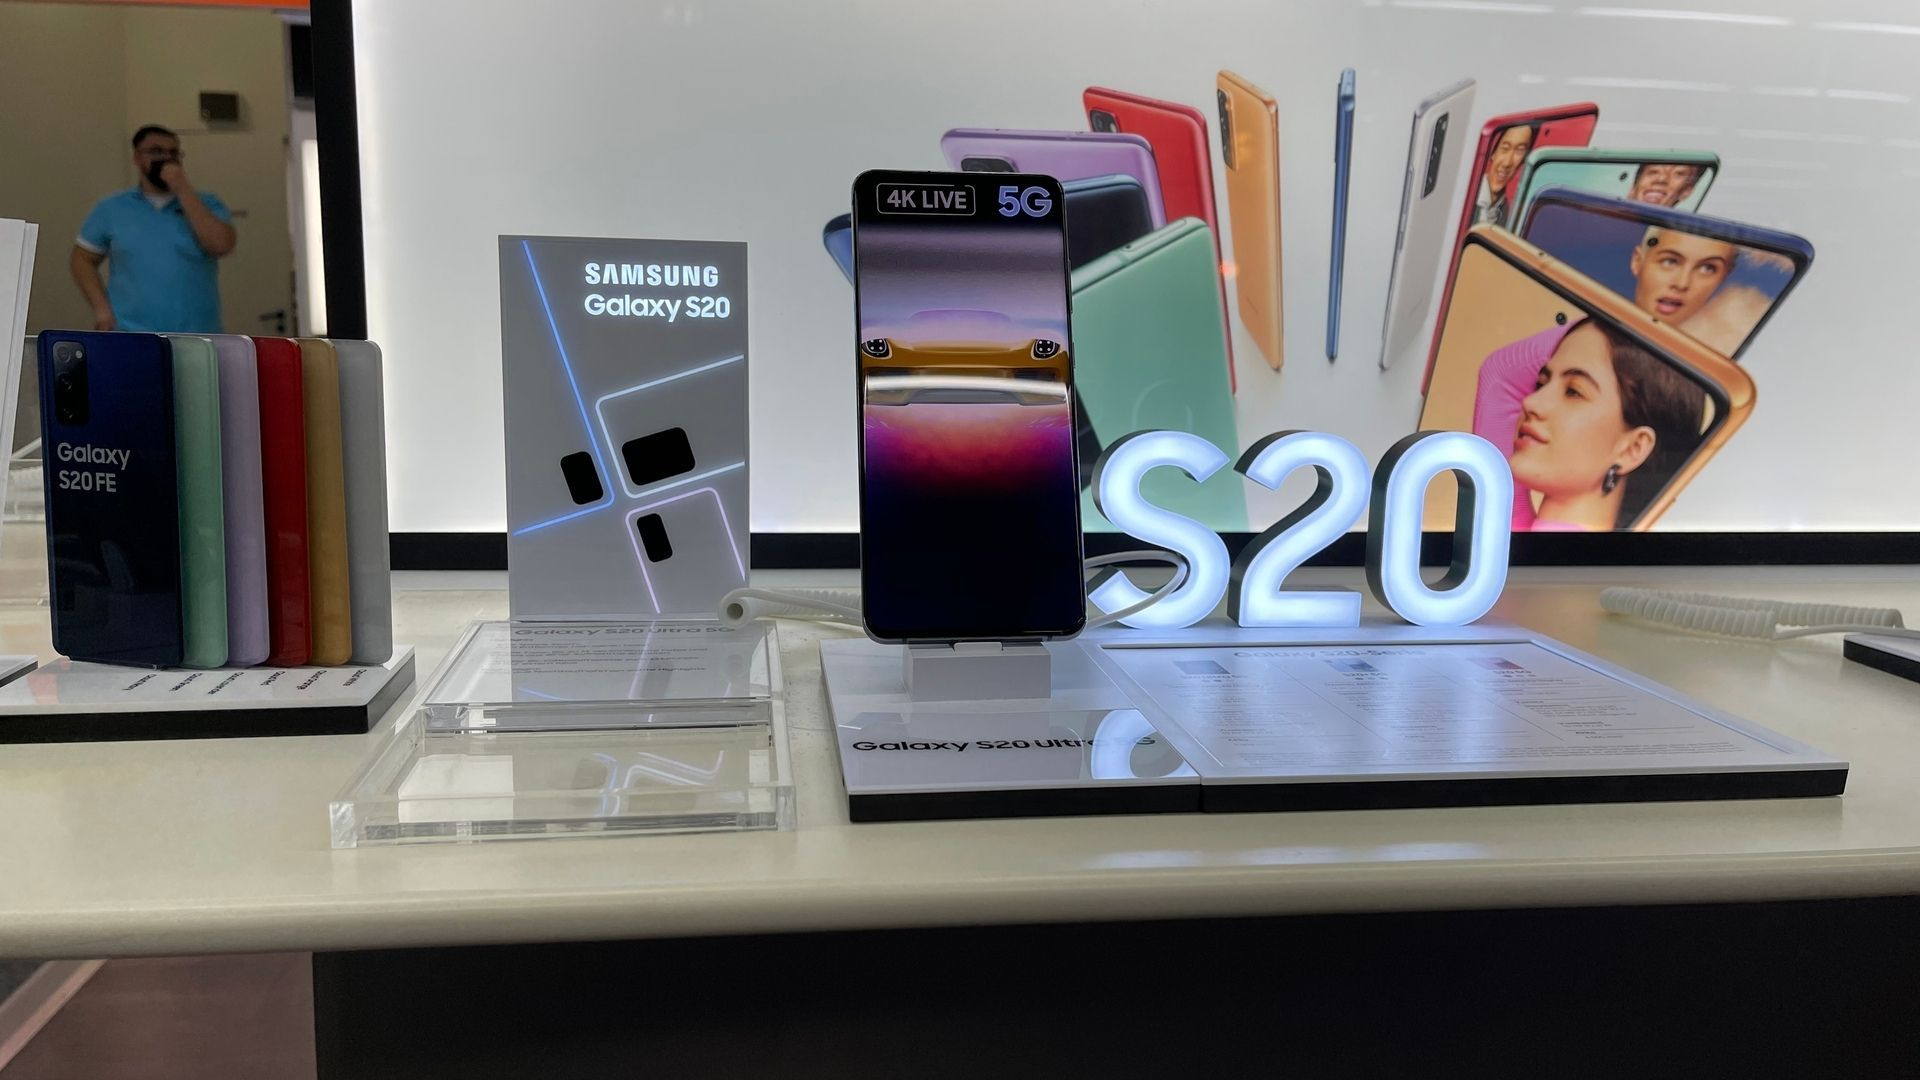 Bateria do Galaxy S20 FE tem capacidade de 4.500 mAh (Foto: ms_pics_and_more/Shutterstock)